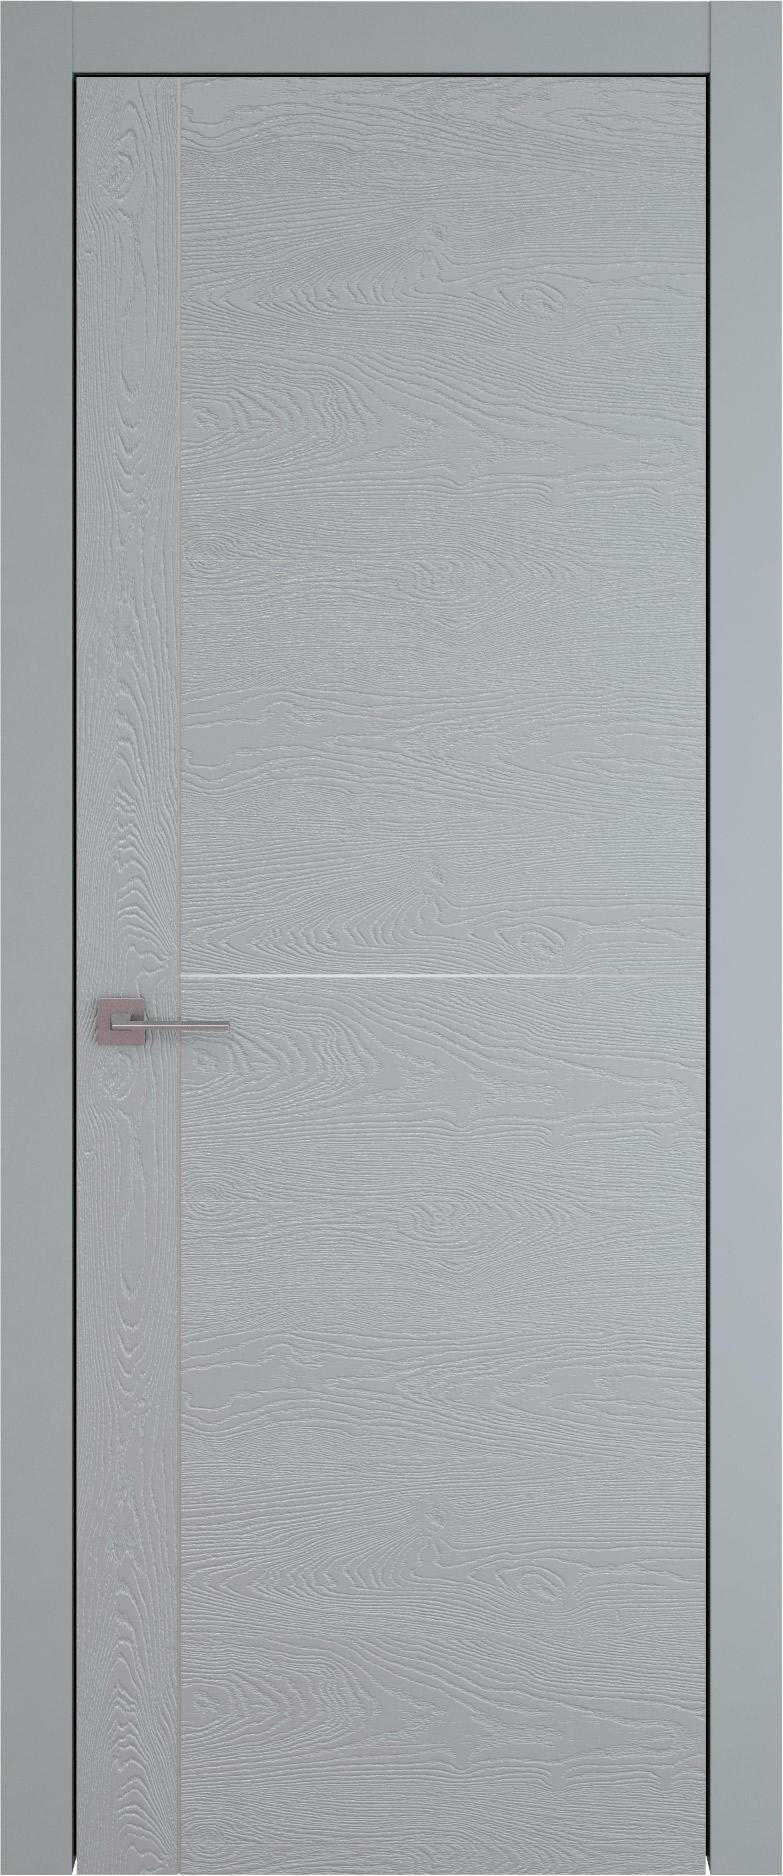 Tivoli Е-3 цвет - Серебристо-серая эмаль по шпону (RAL 7045) Без стекла (ДГ)